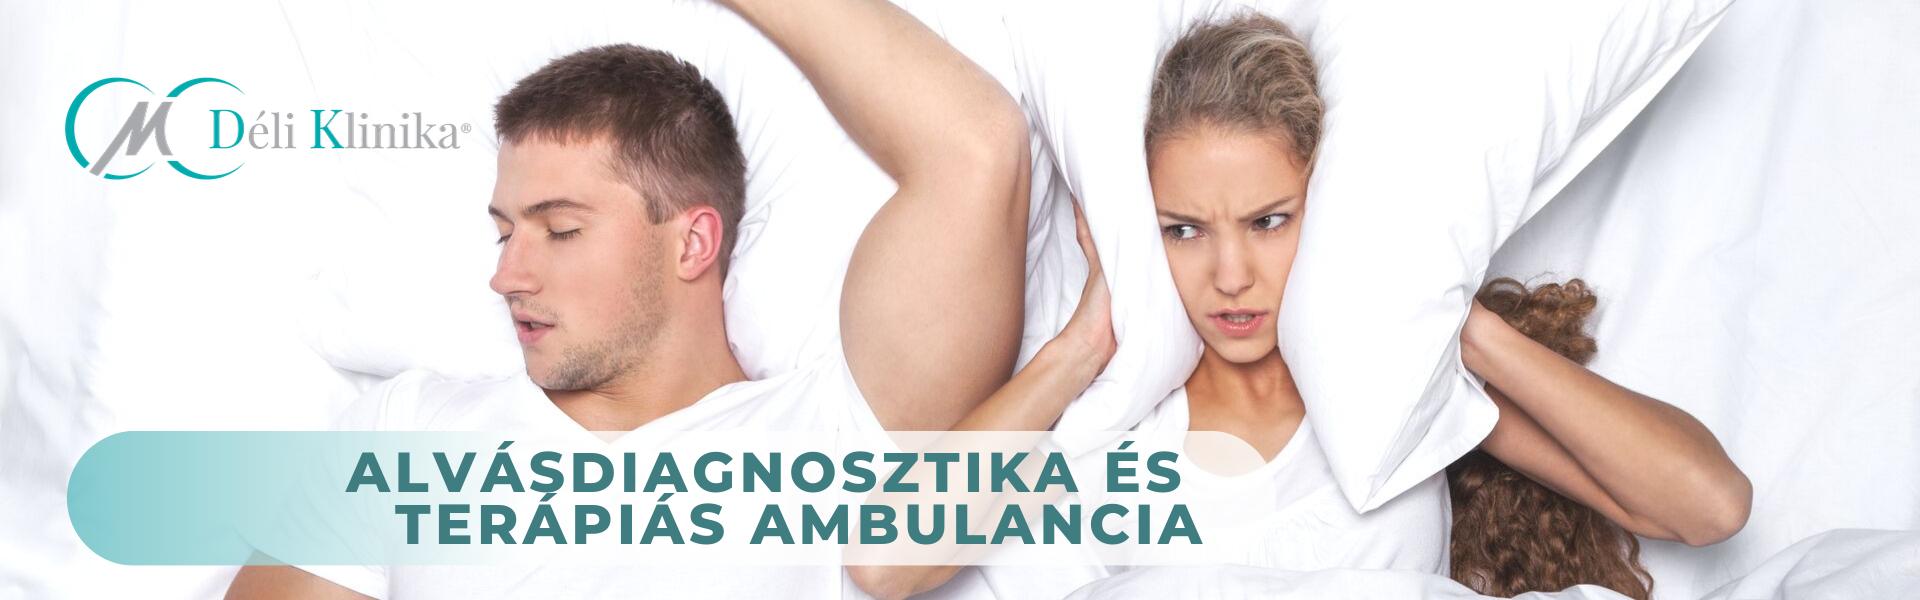 Alvasdiagnosztika Es Terapias Ambulancia